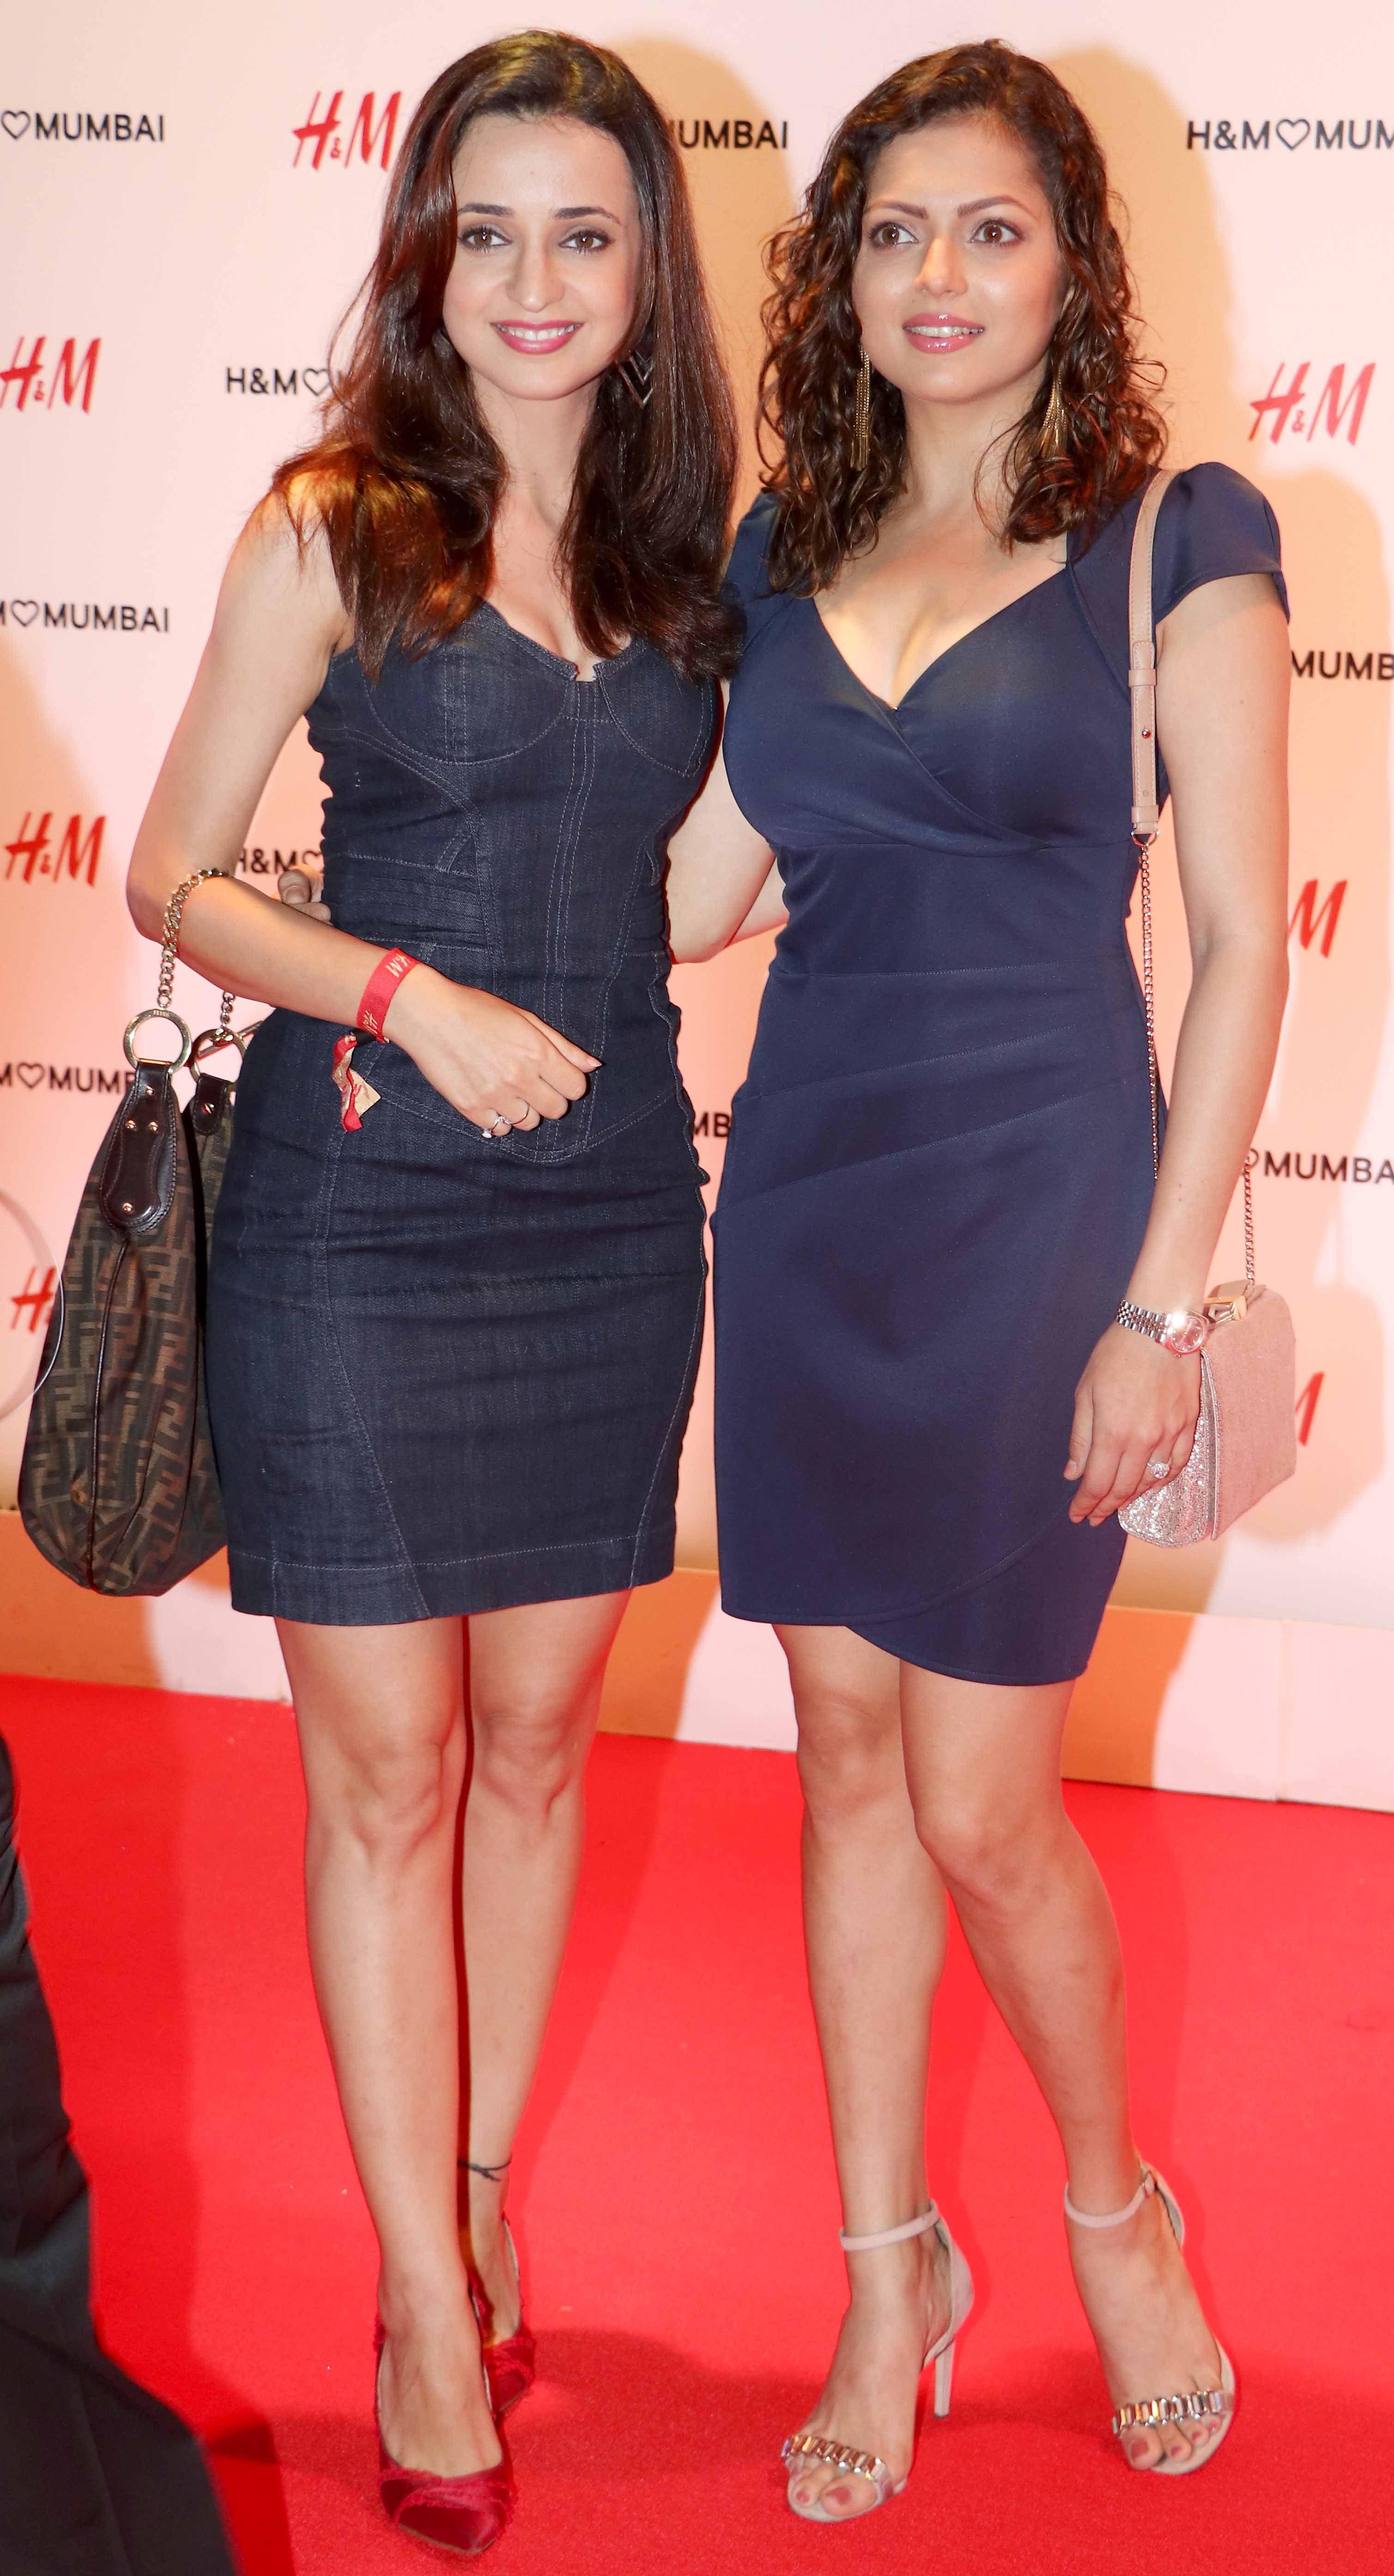 Sanaya Irani And Drashti Dhami At Hms Store Launch Bash In Mumbai Bollywood Fashion Style Beauty Hot Sexy